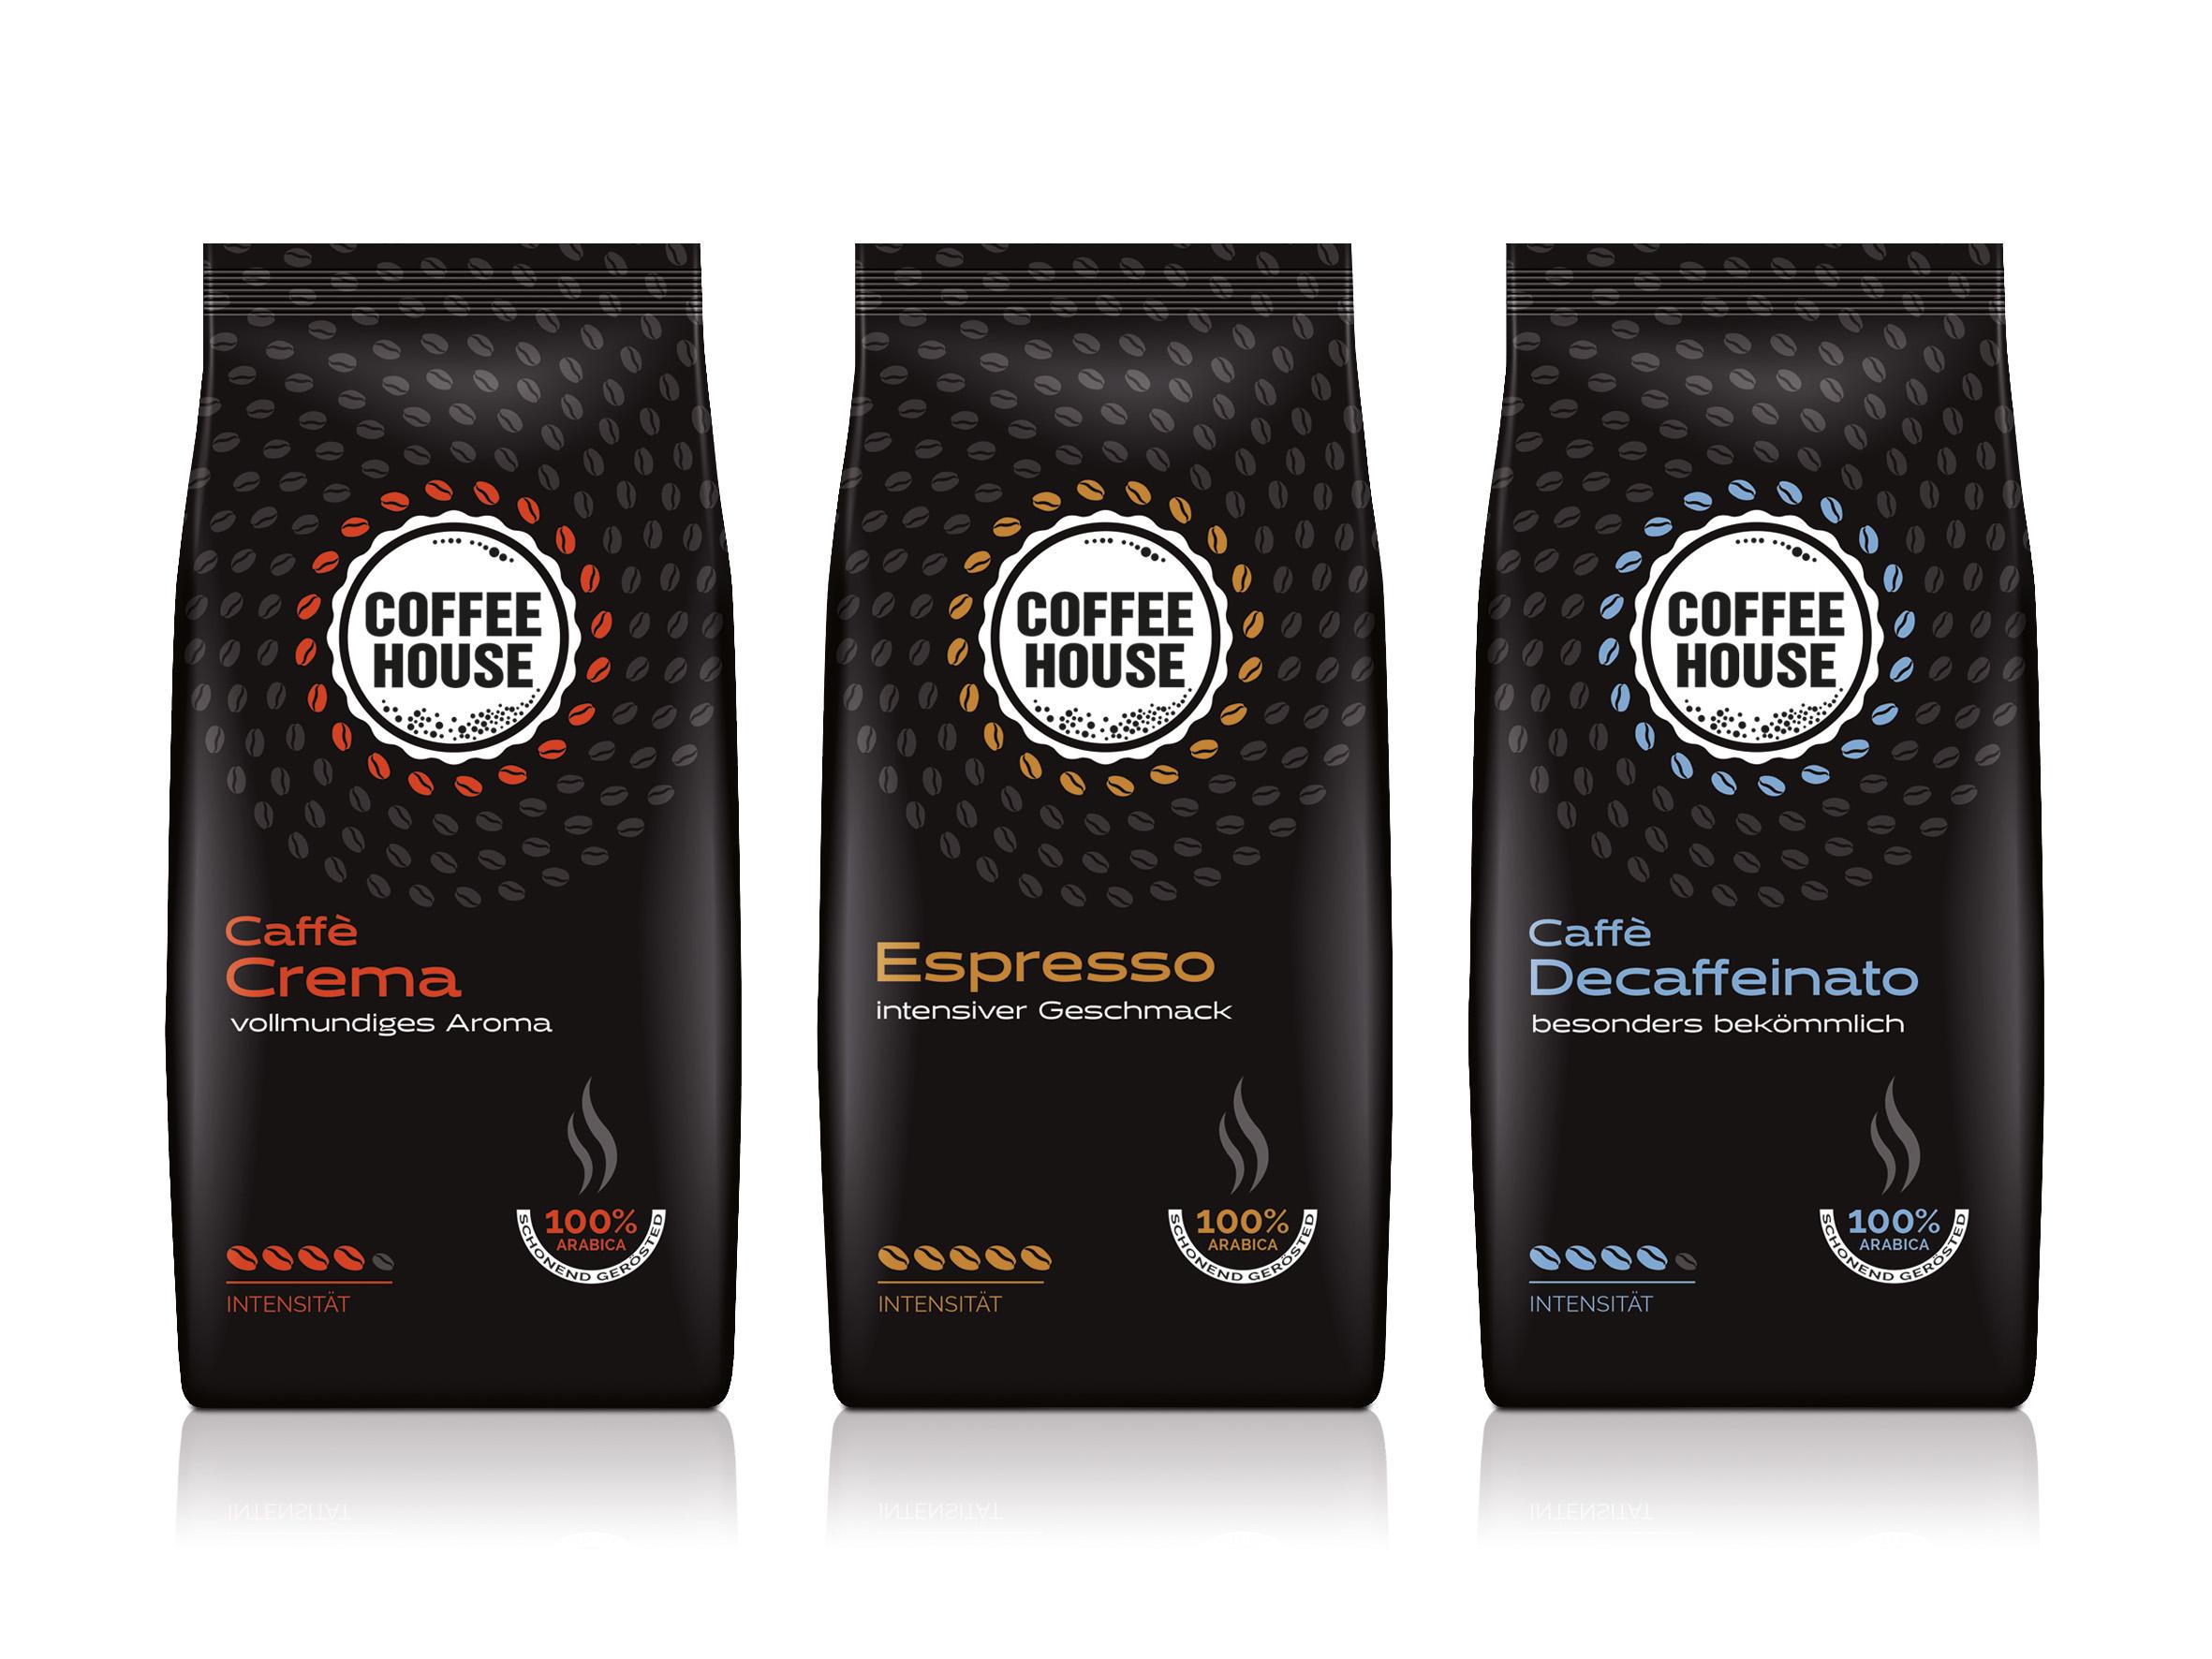 Coffee House Caffes 01